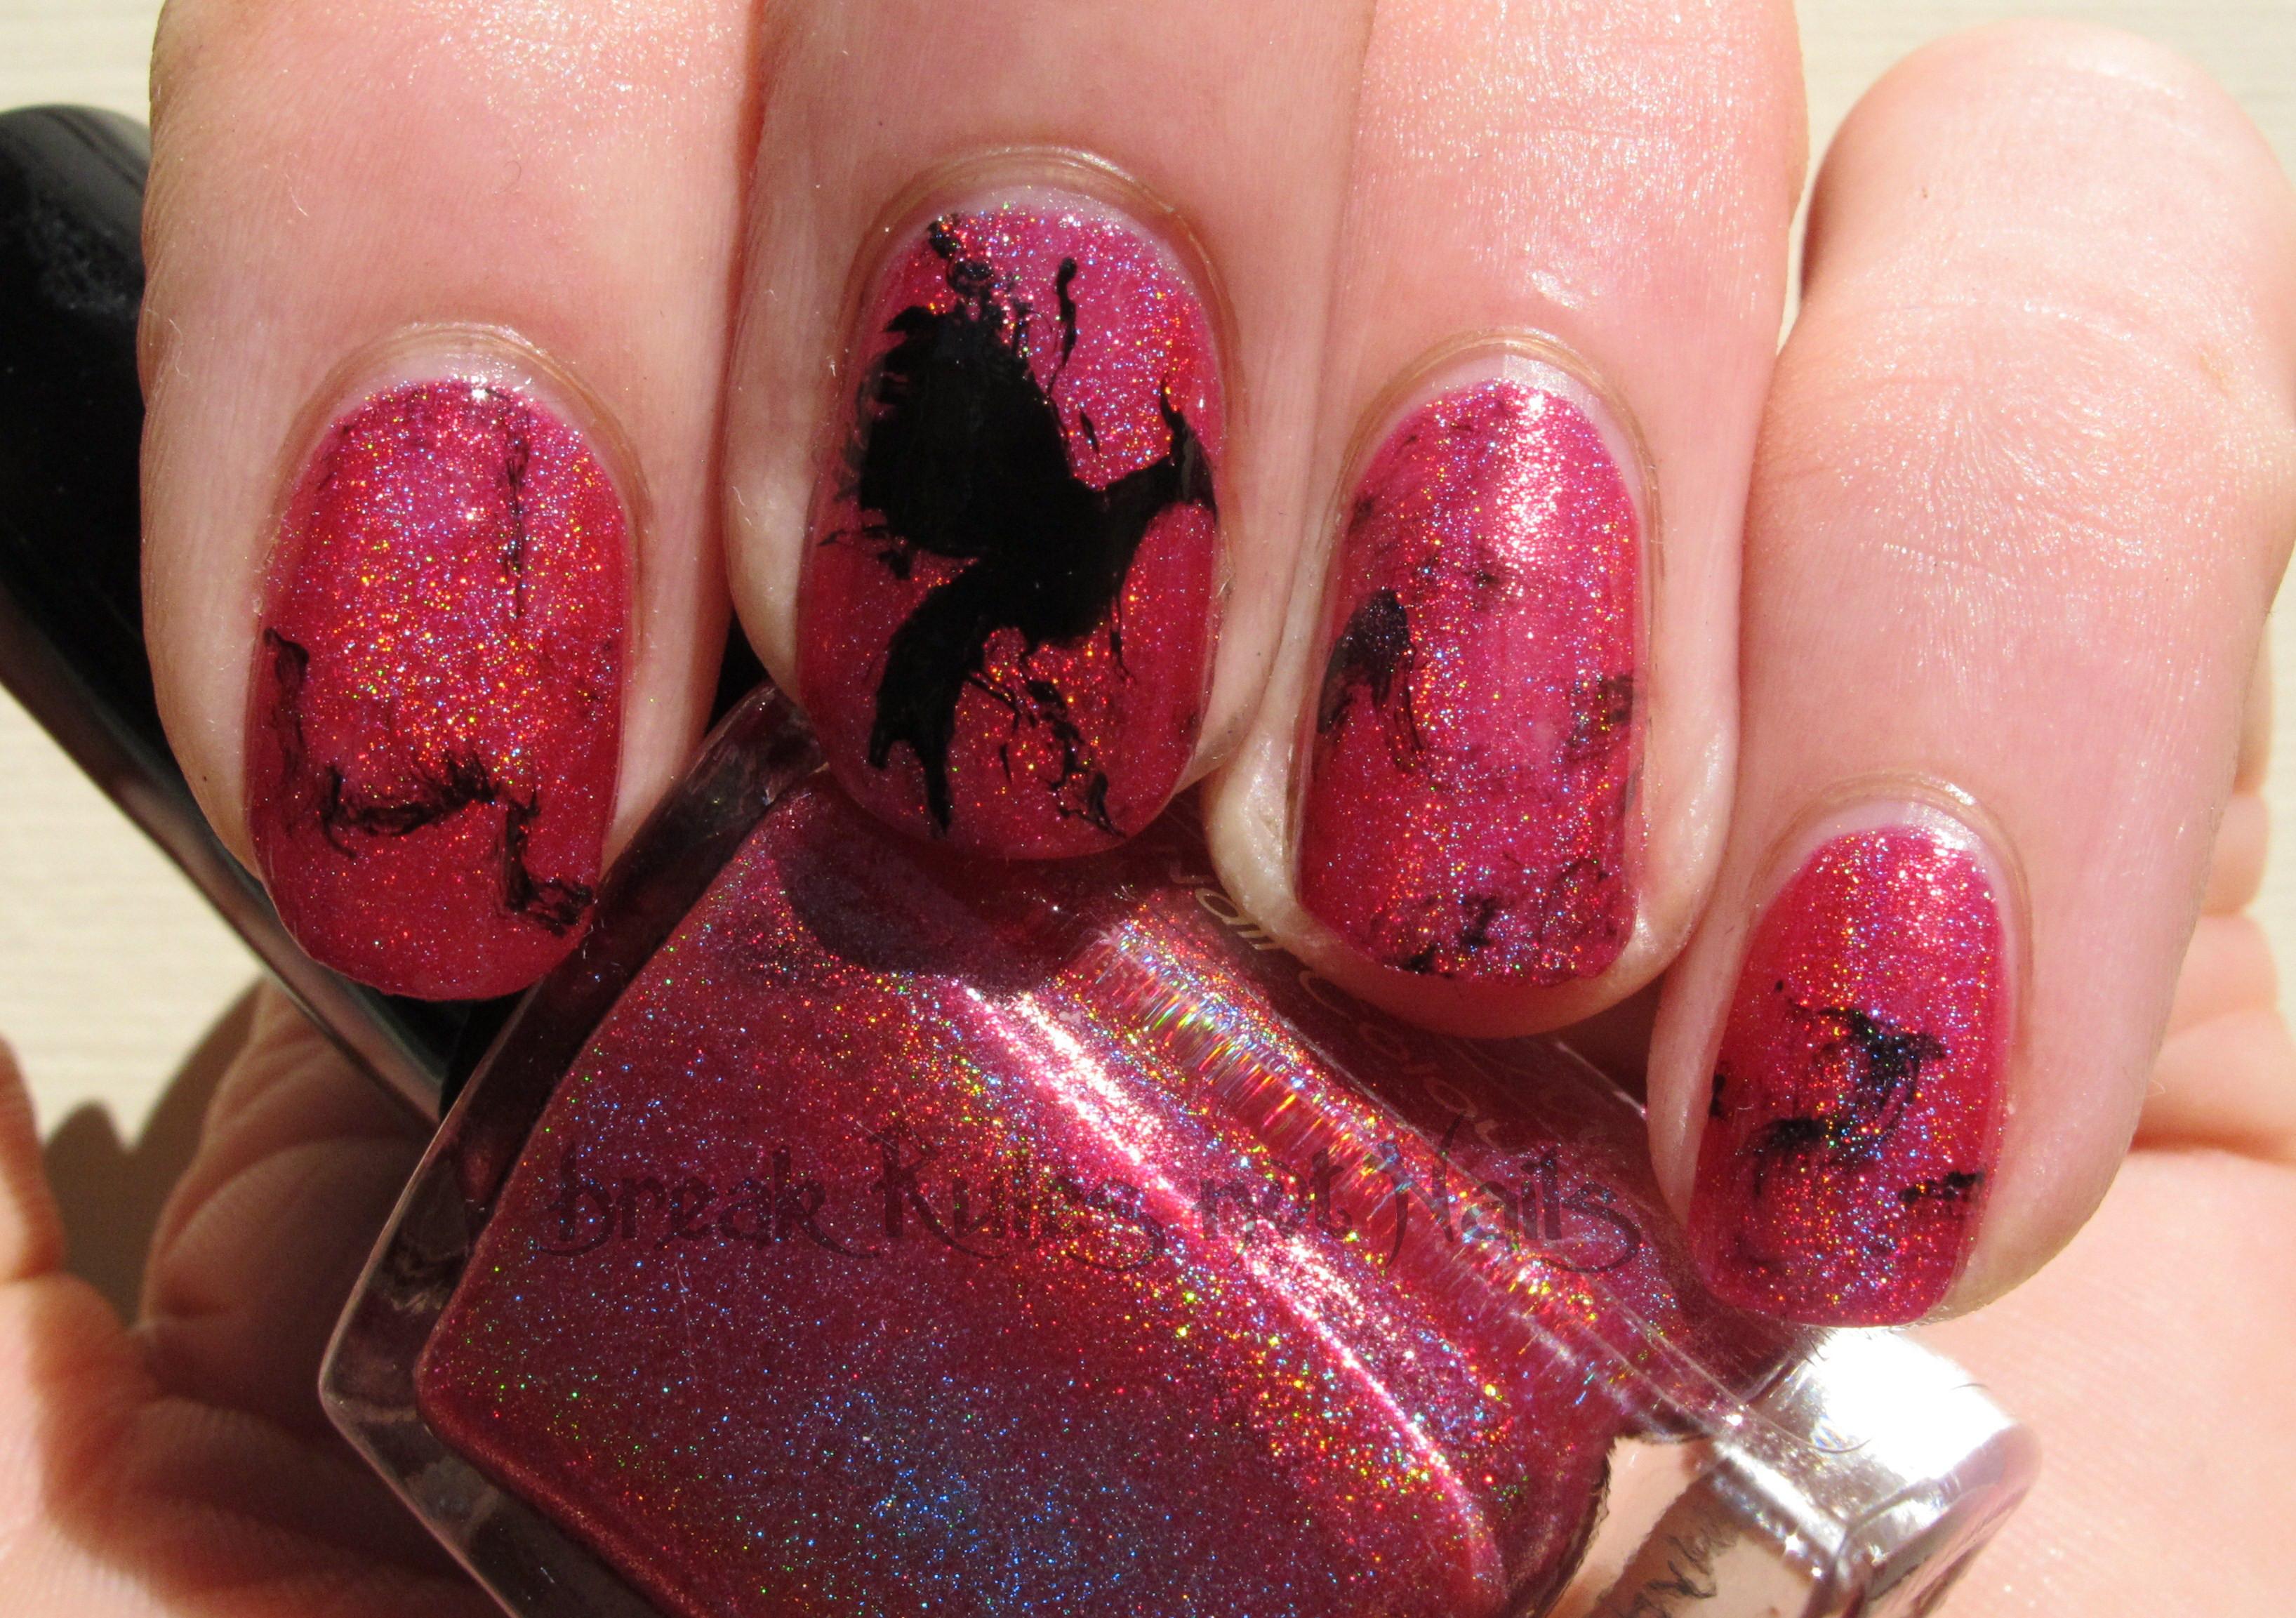 Hunger Games Nail Art Break Rules Not Nails